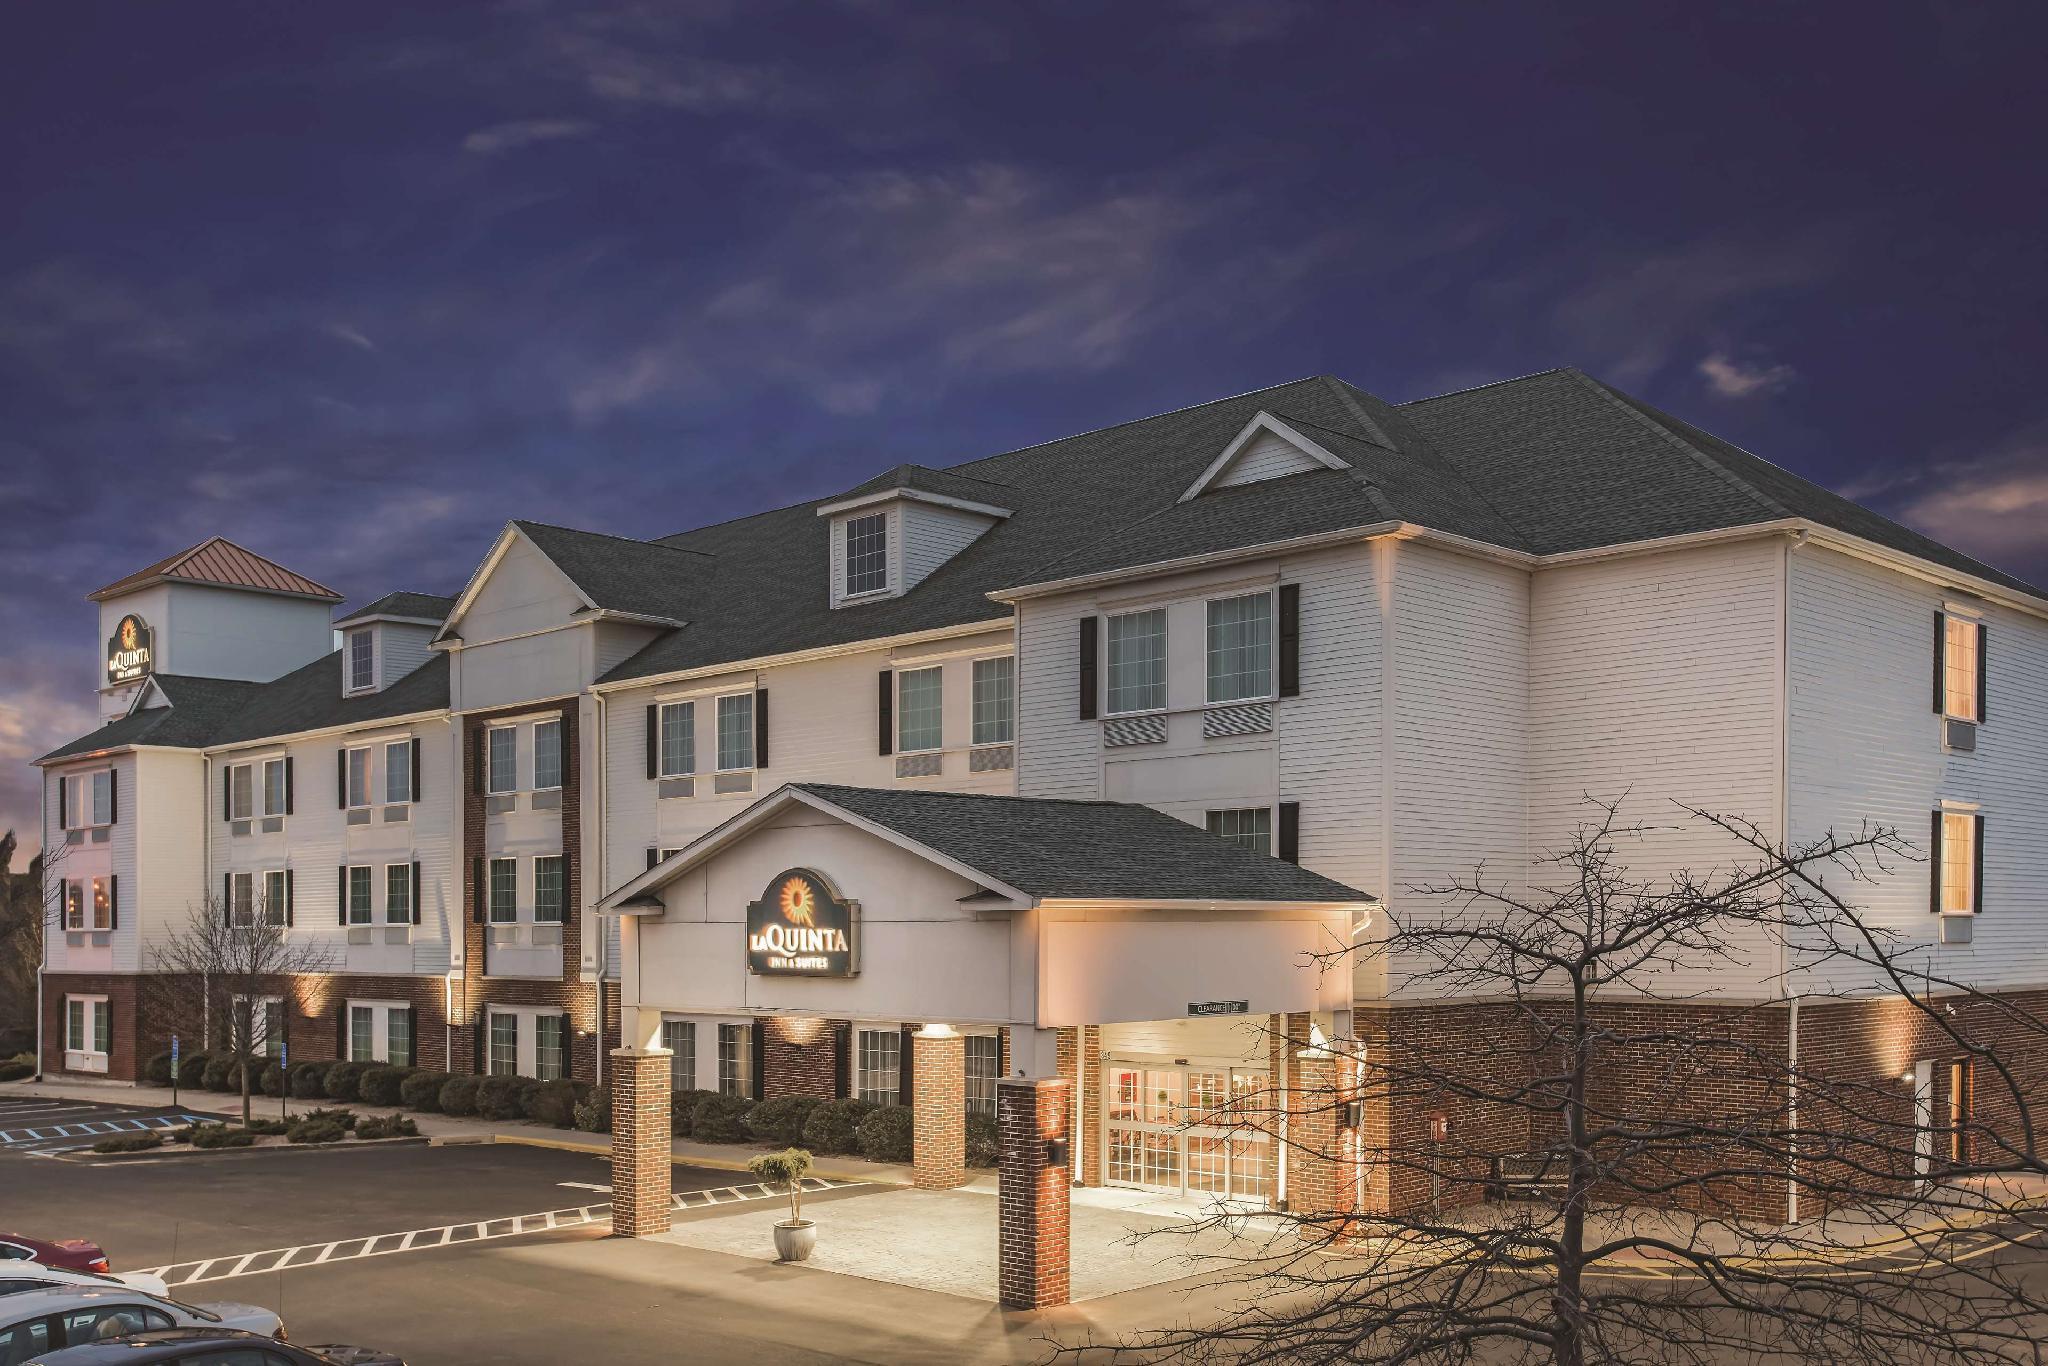 La Quinta Inn And Suites By Wyndham Stonington Mystic Area